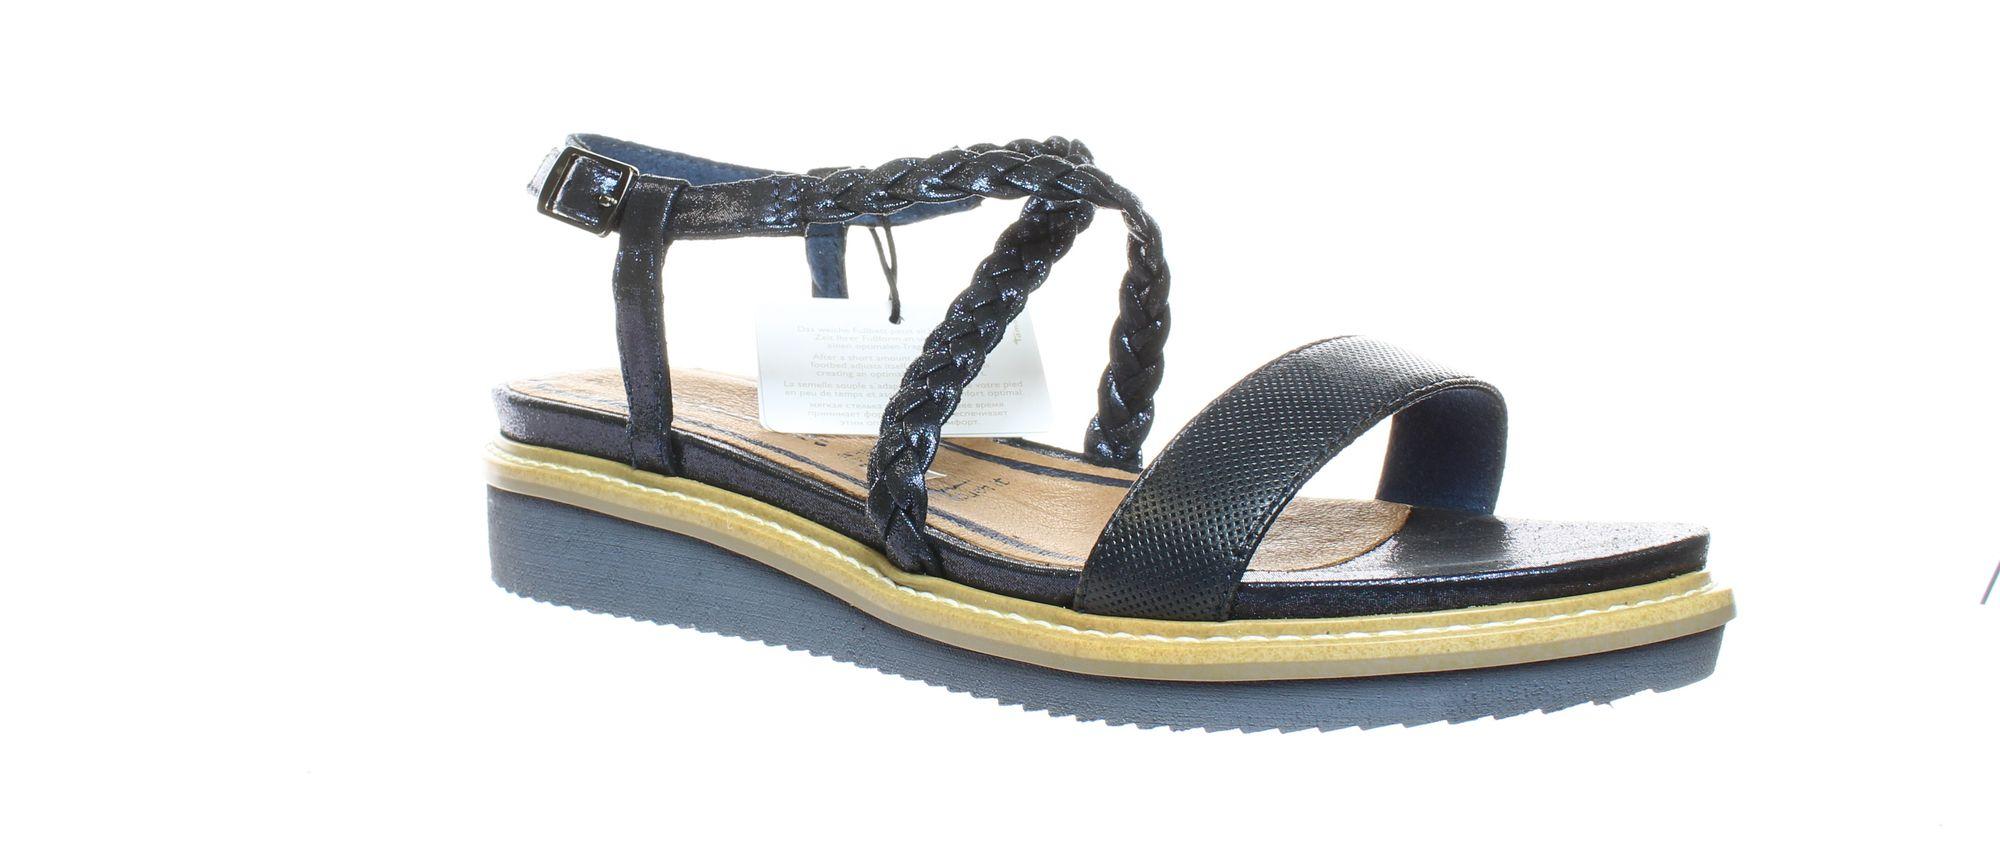 Tamaris Womens 28206 Leather Open Toe Casual Platform Sandals